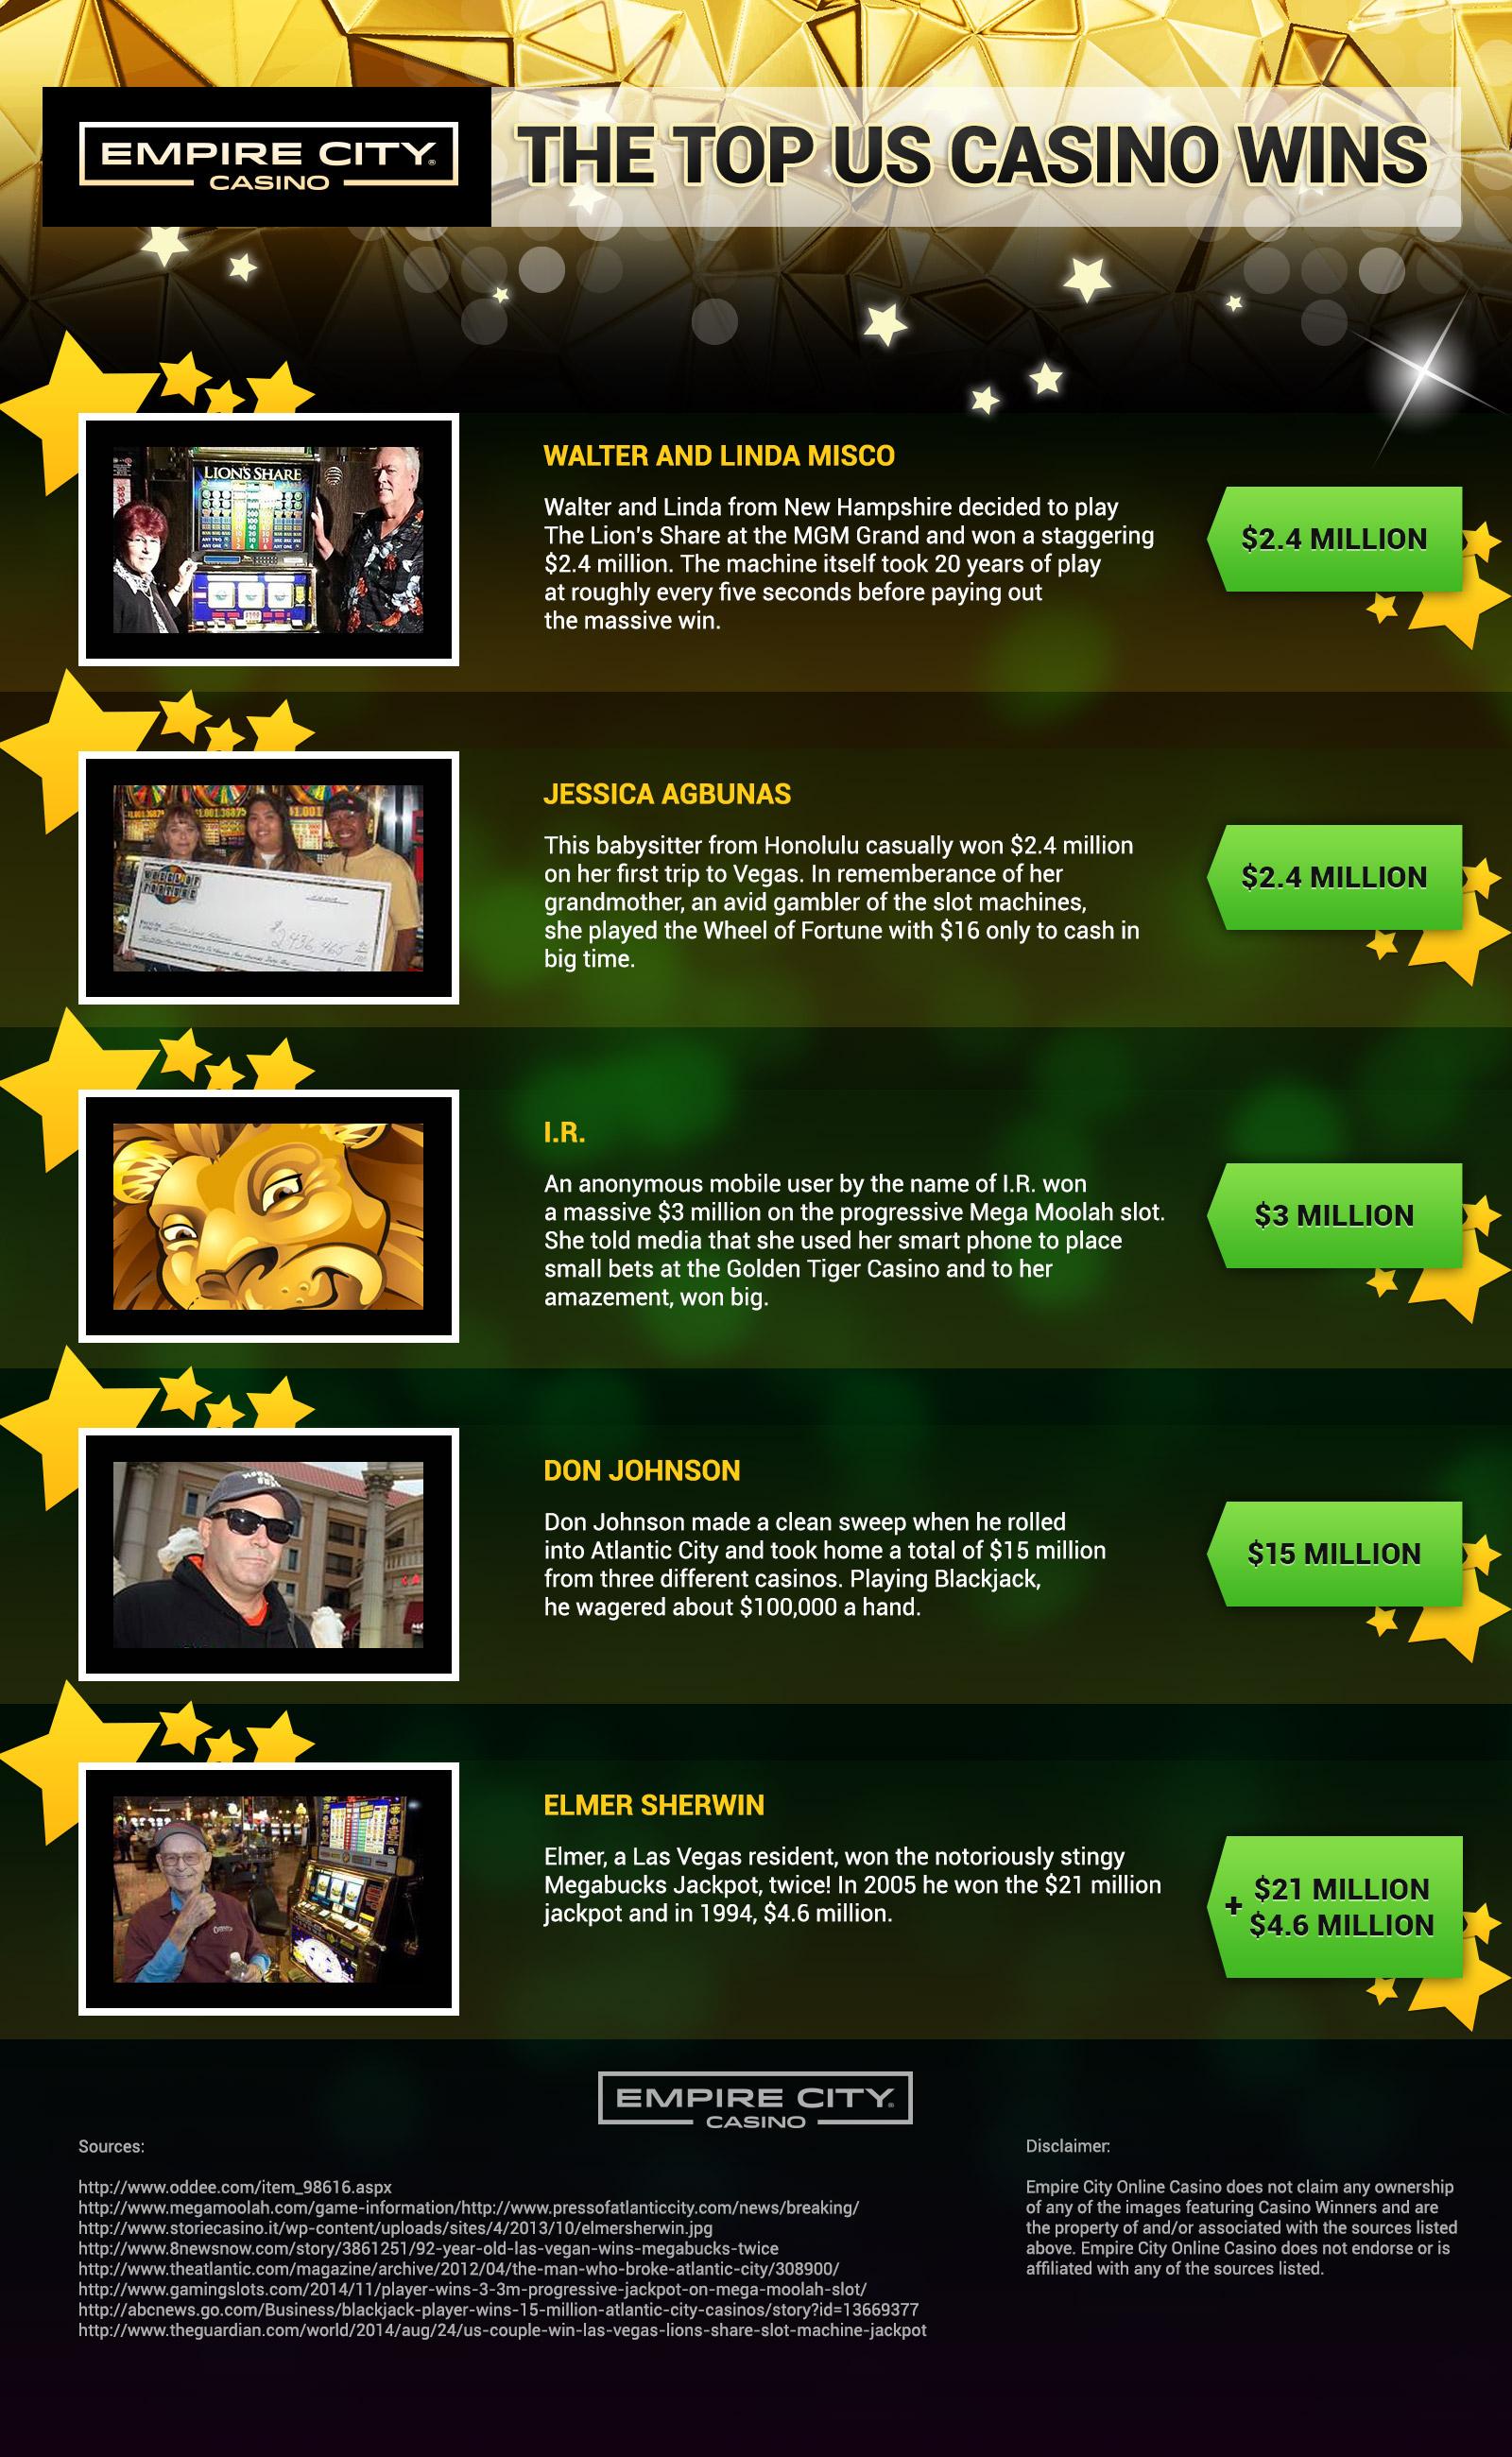 Casino Wins Infographic